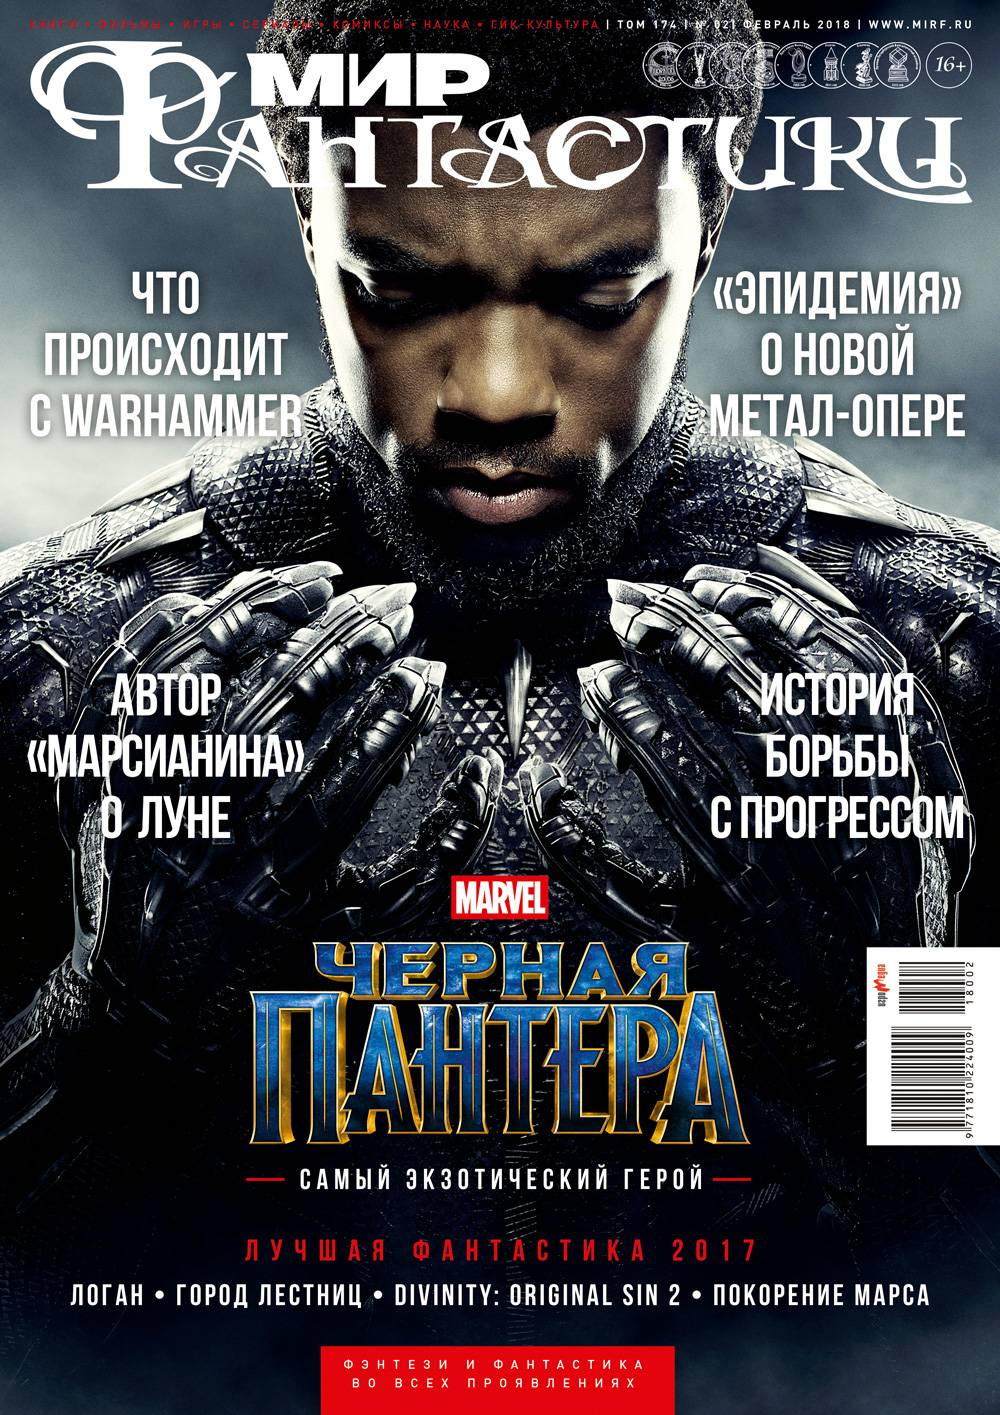 Мир фантастики №174 (февраль 2018)